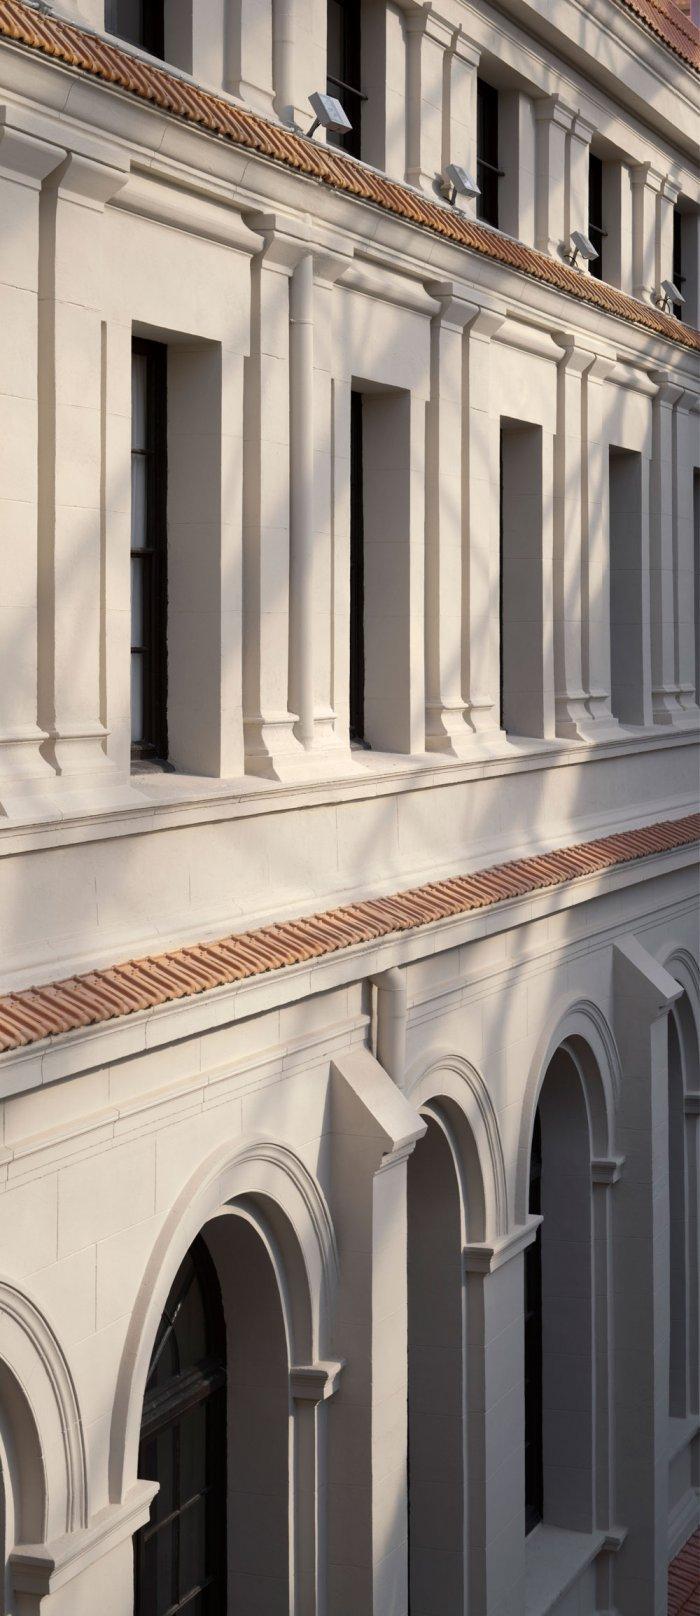 European Architectural Design - University of Duesto with Renewed Interior Design